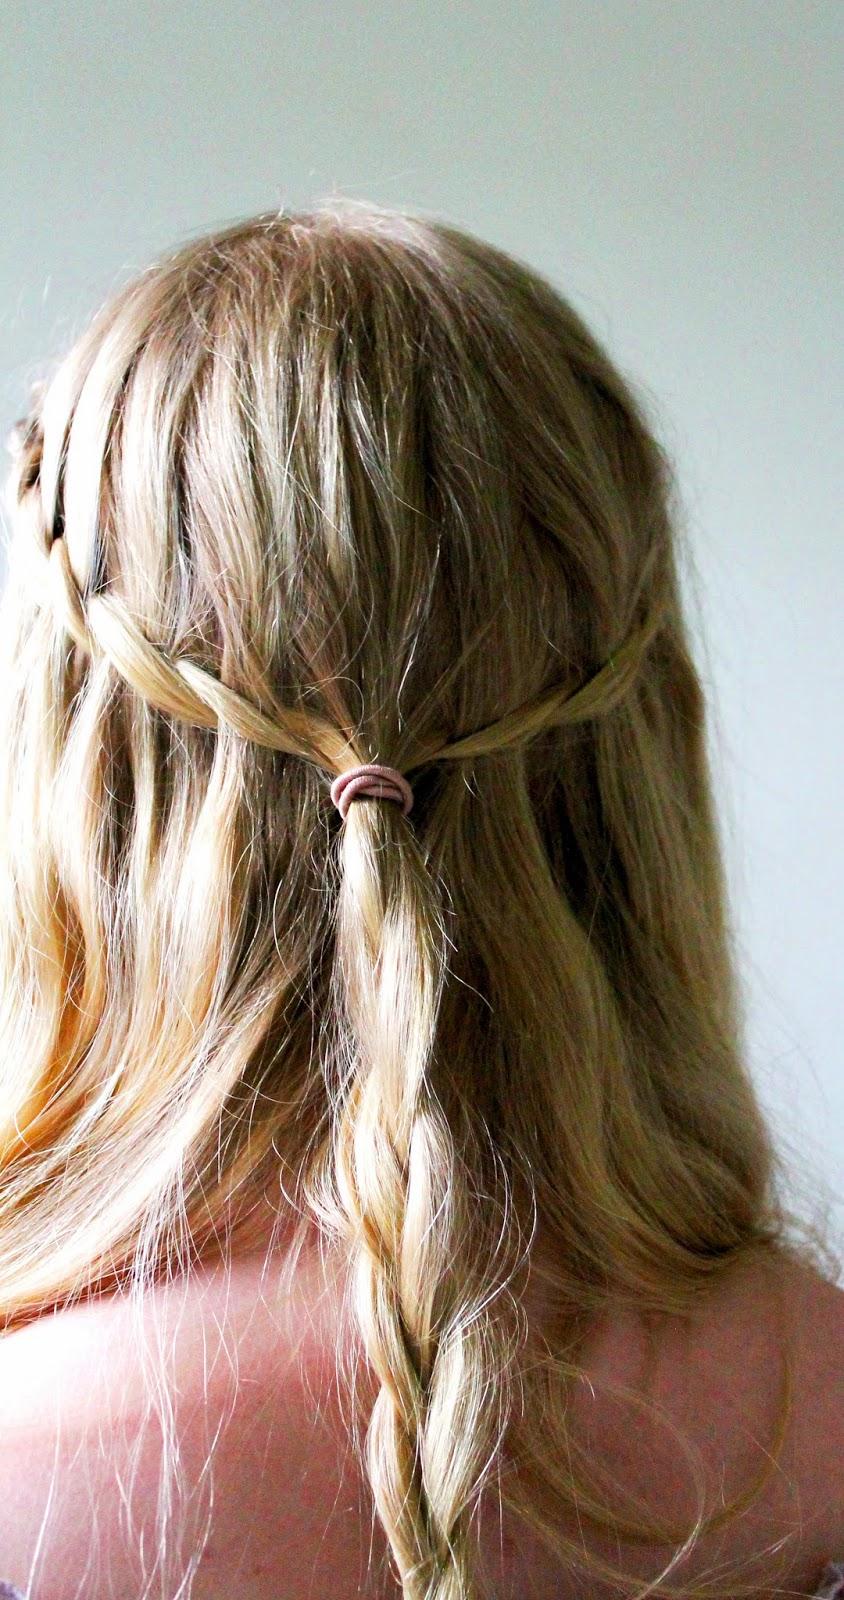 Game of thrones waterfall braid how to | Alinan kotona blog